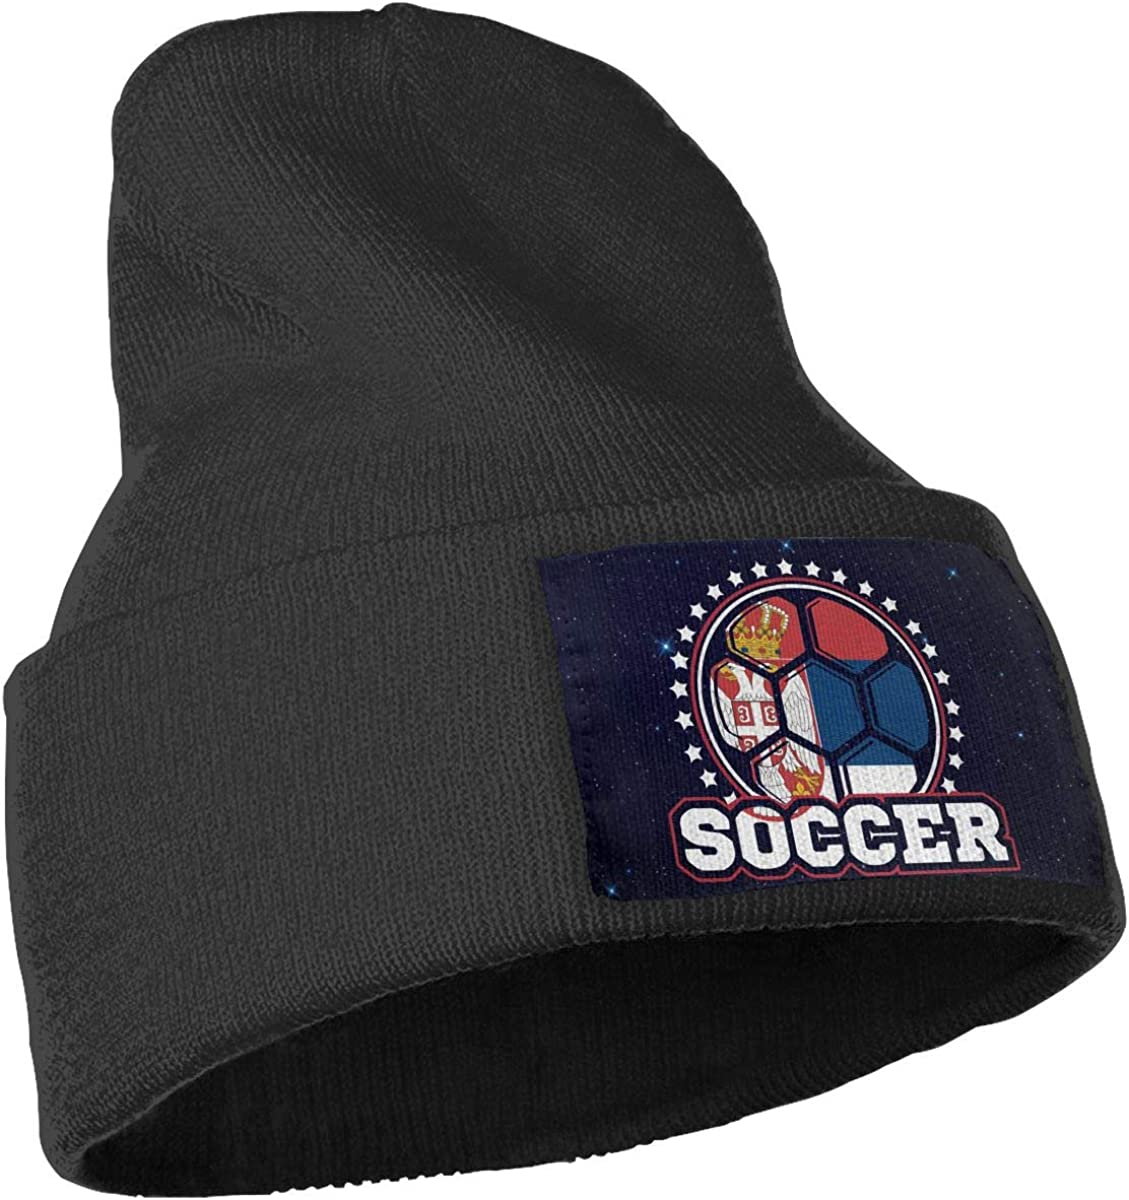 Serbia Flag Soccer Player Skull Cap Men Women Knit Hats Stretchy /& Soft Beanie